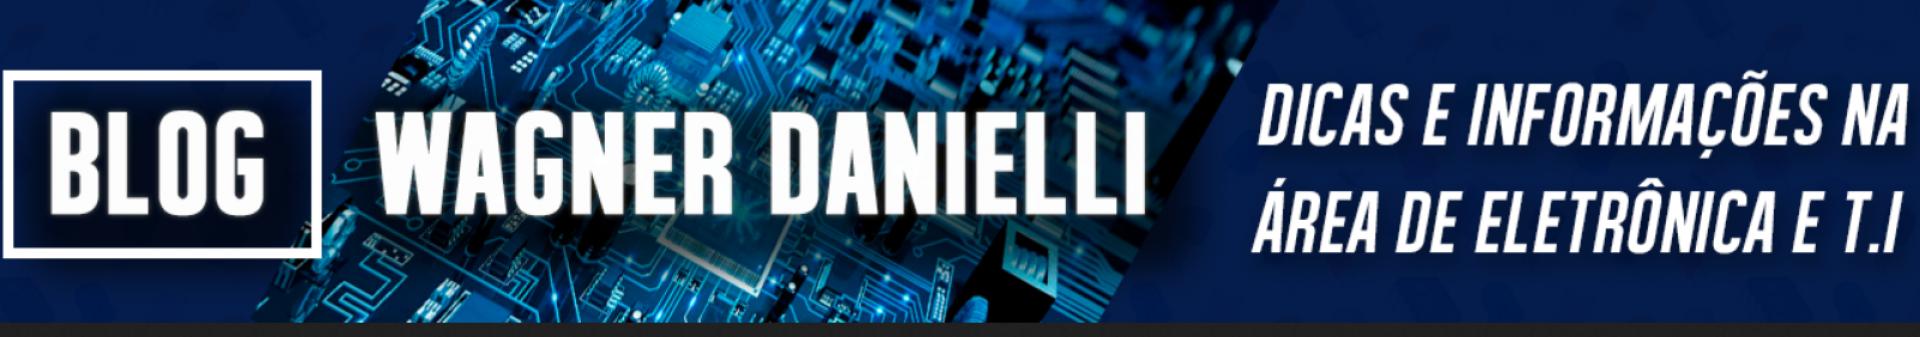 Wagner Danielli